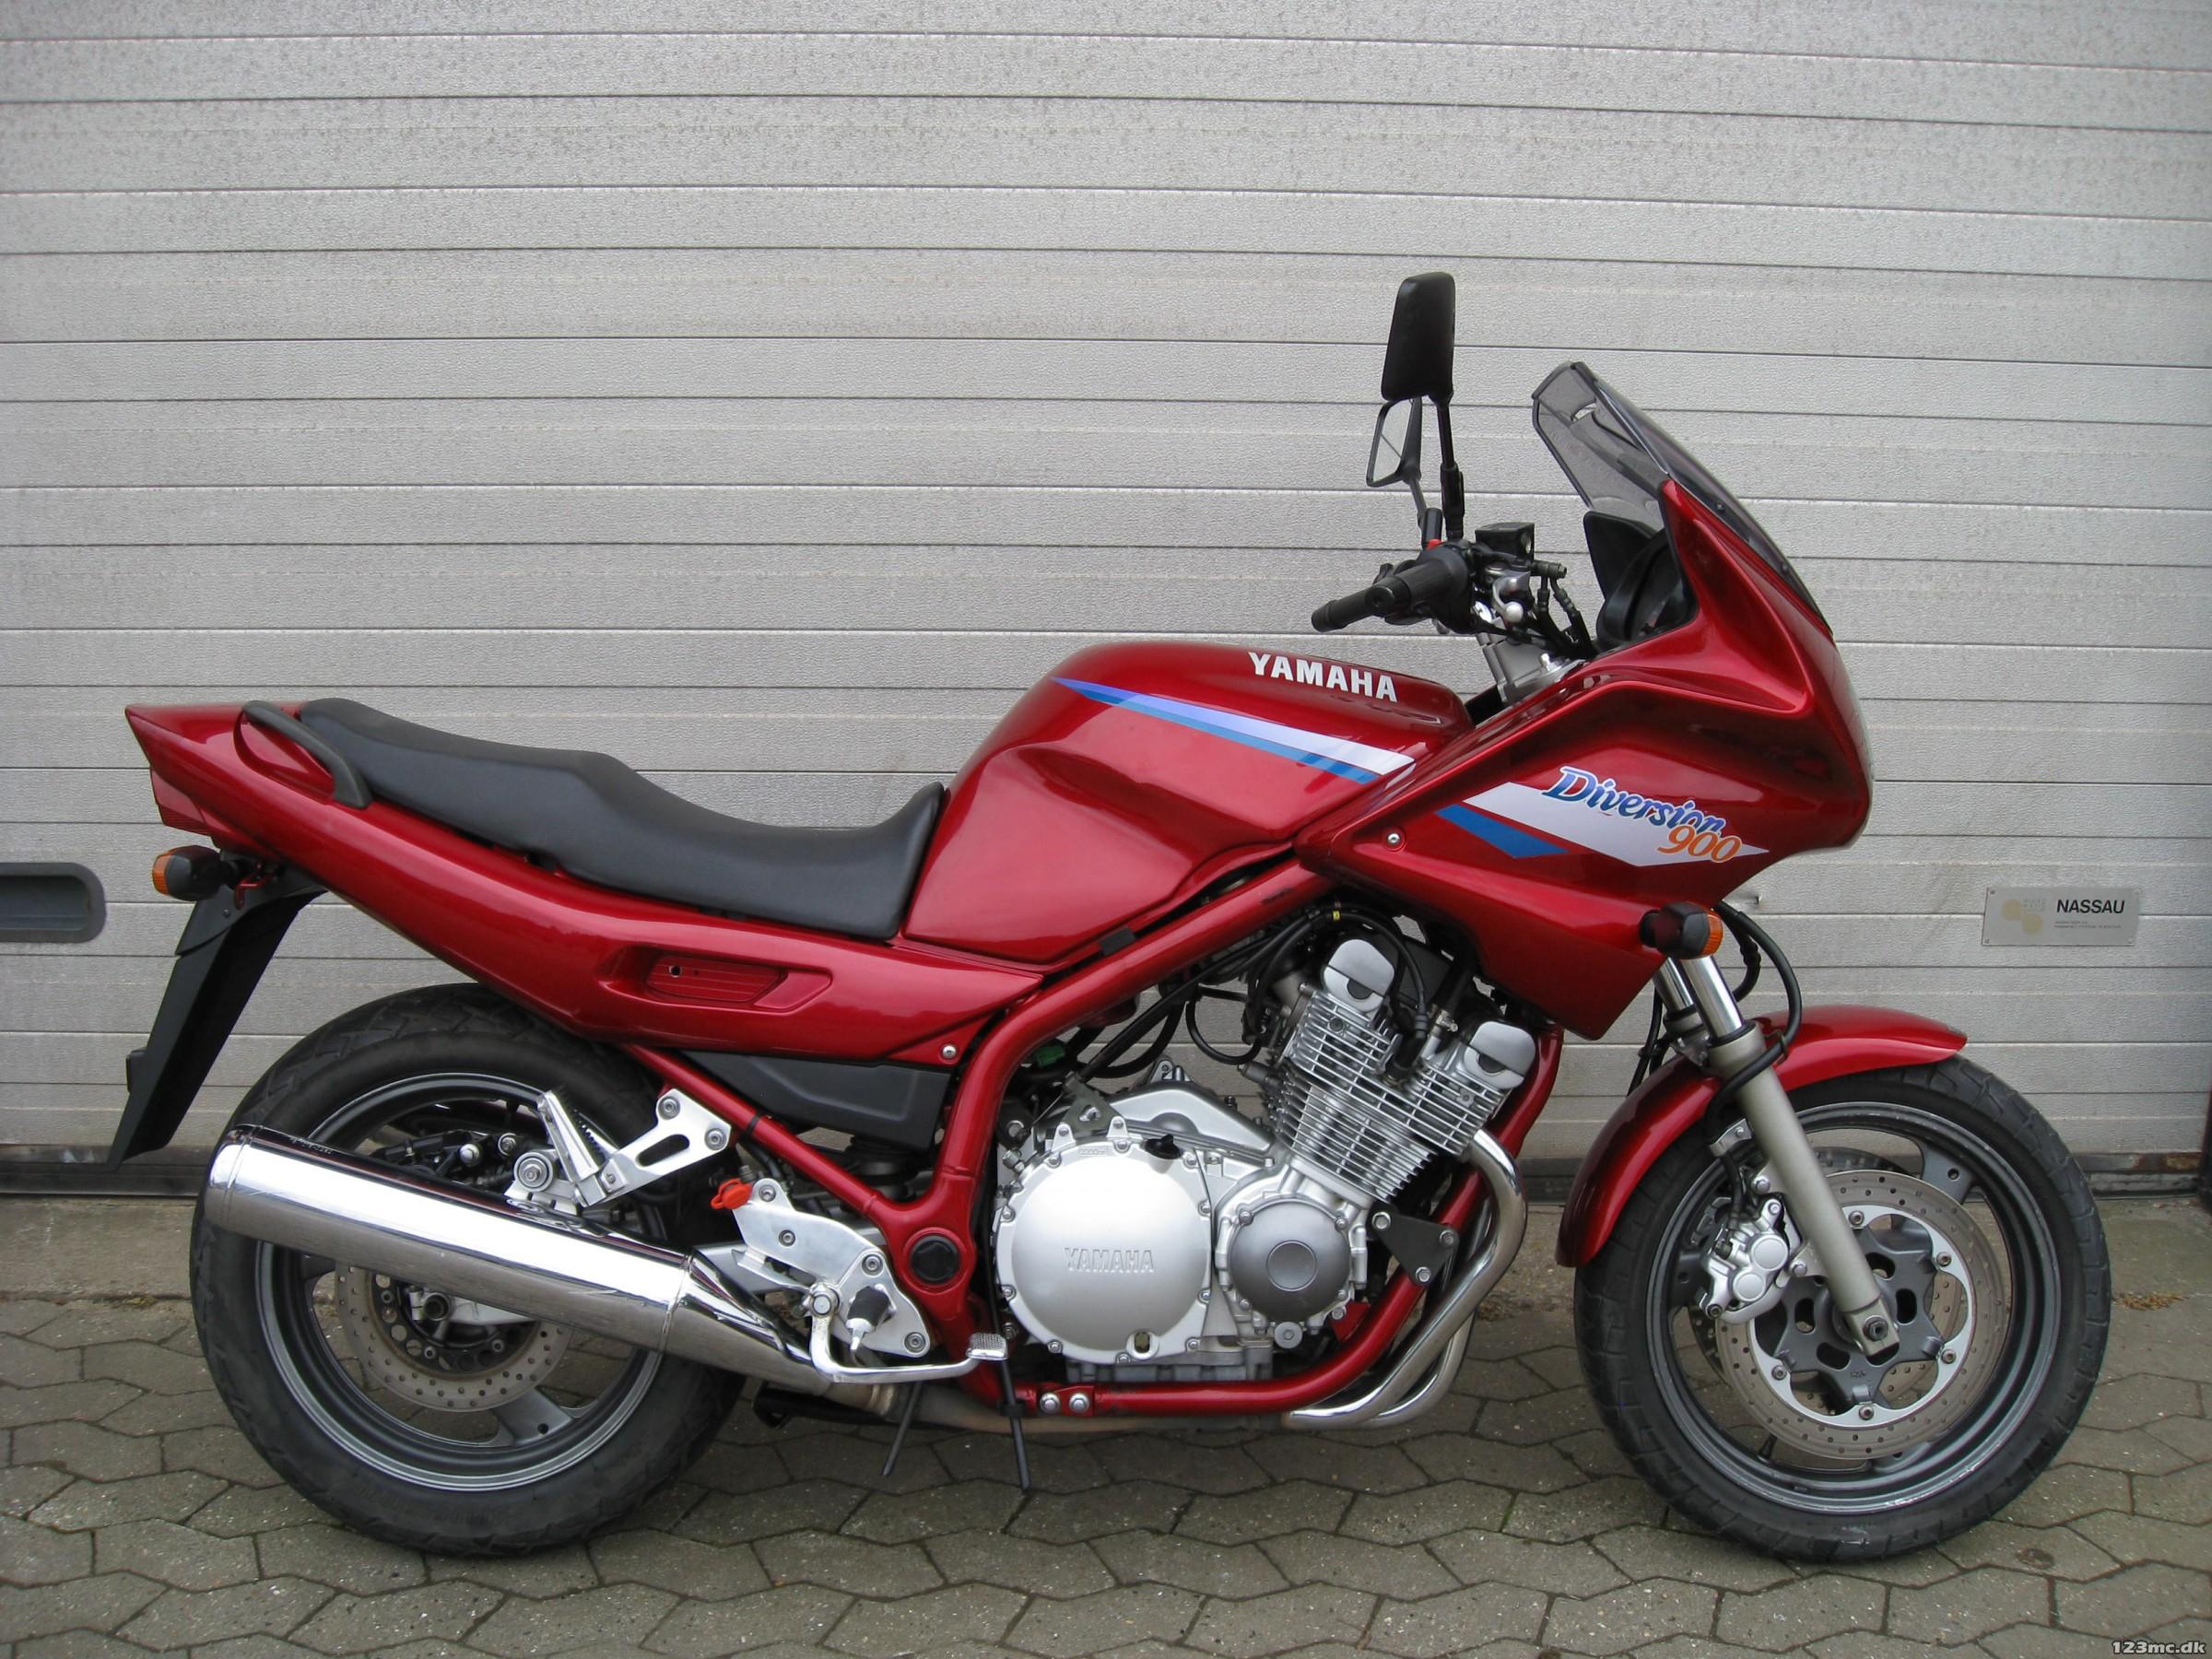 Yamaha XJ 900 S Diversion